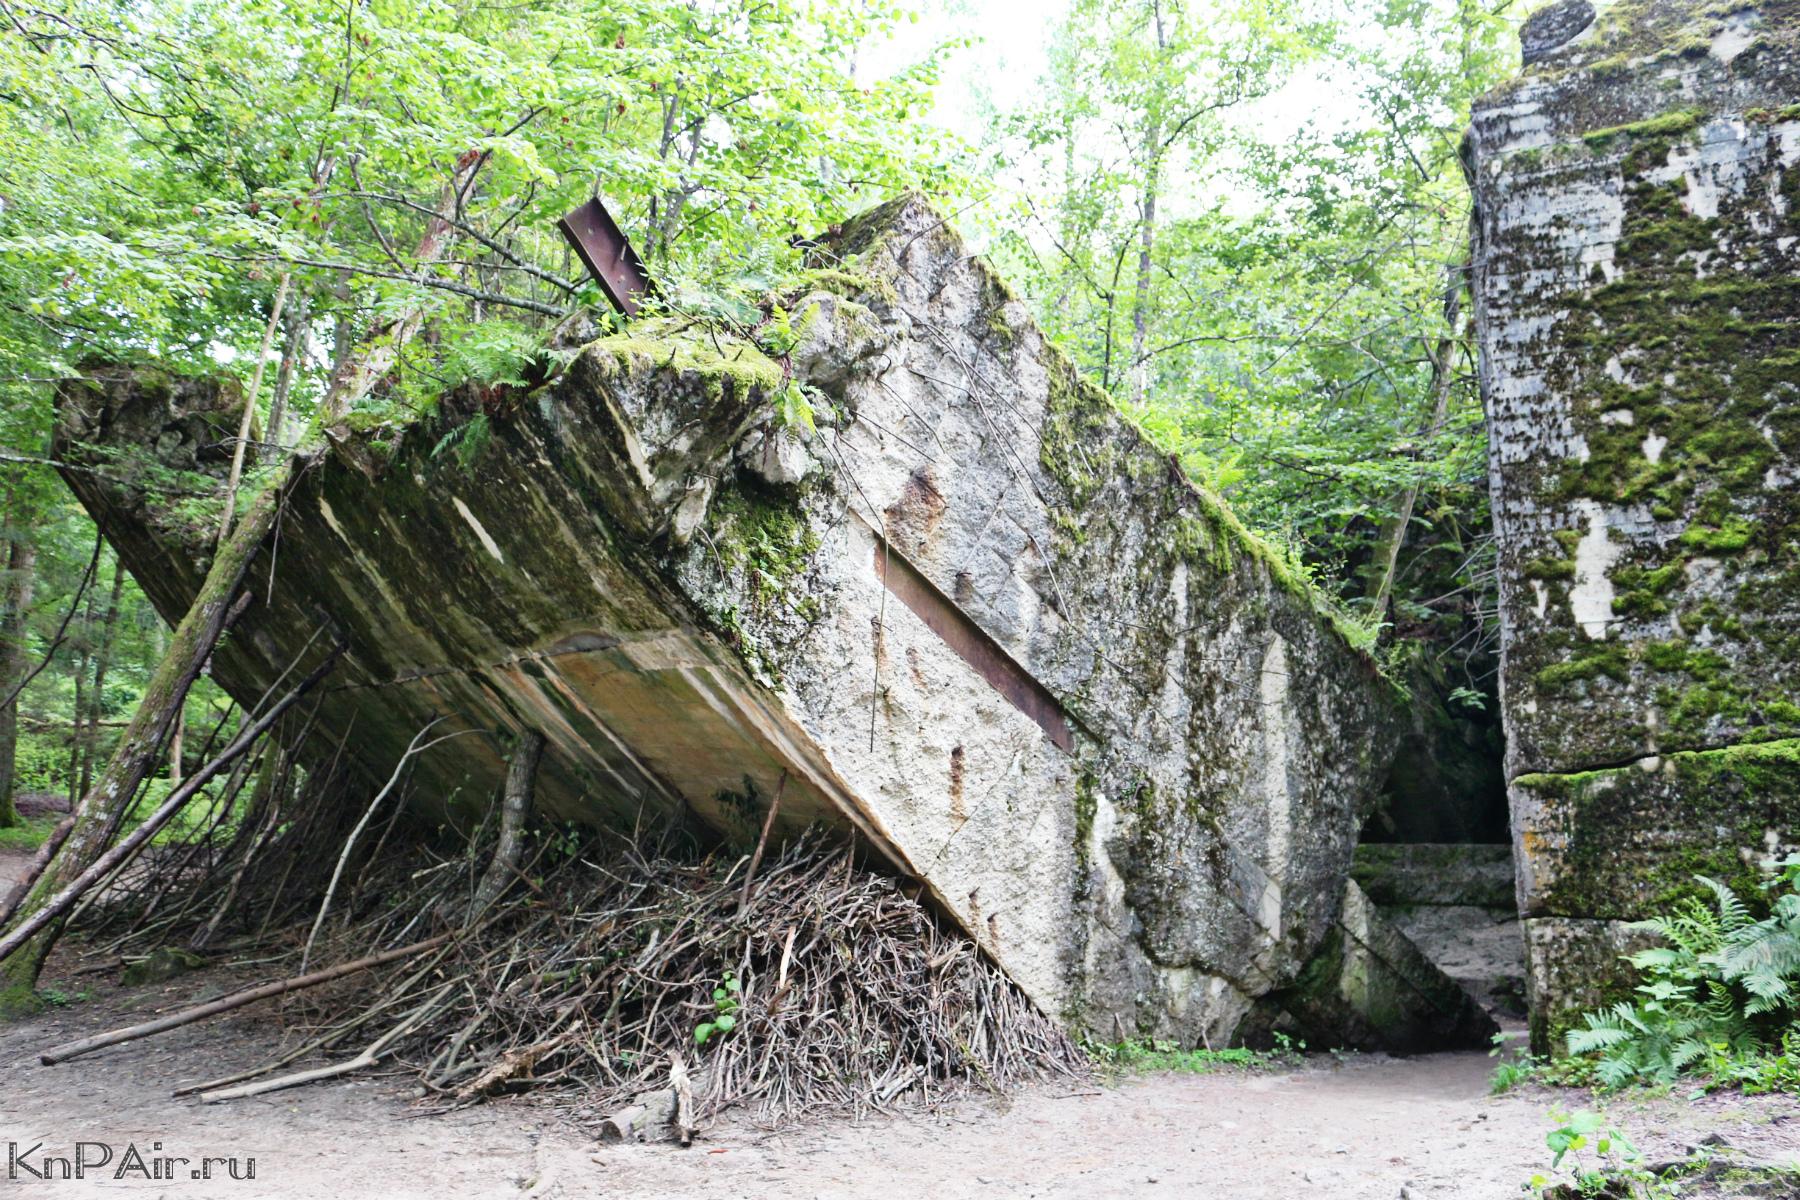 Plita s Armaturoi v Volchiem logove